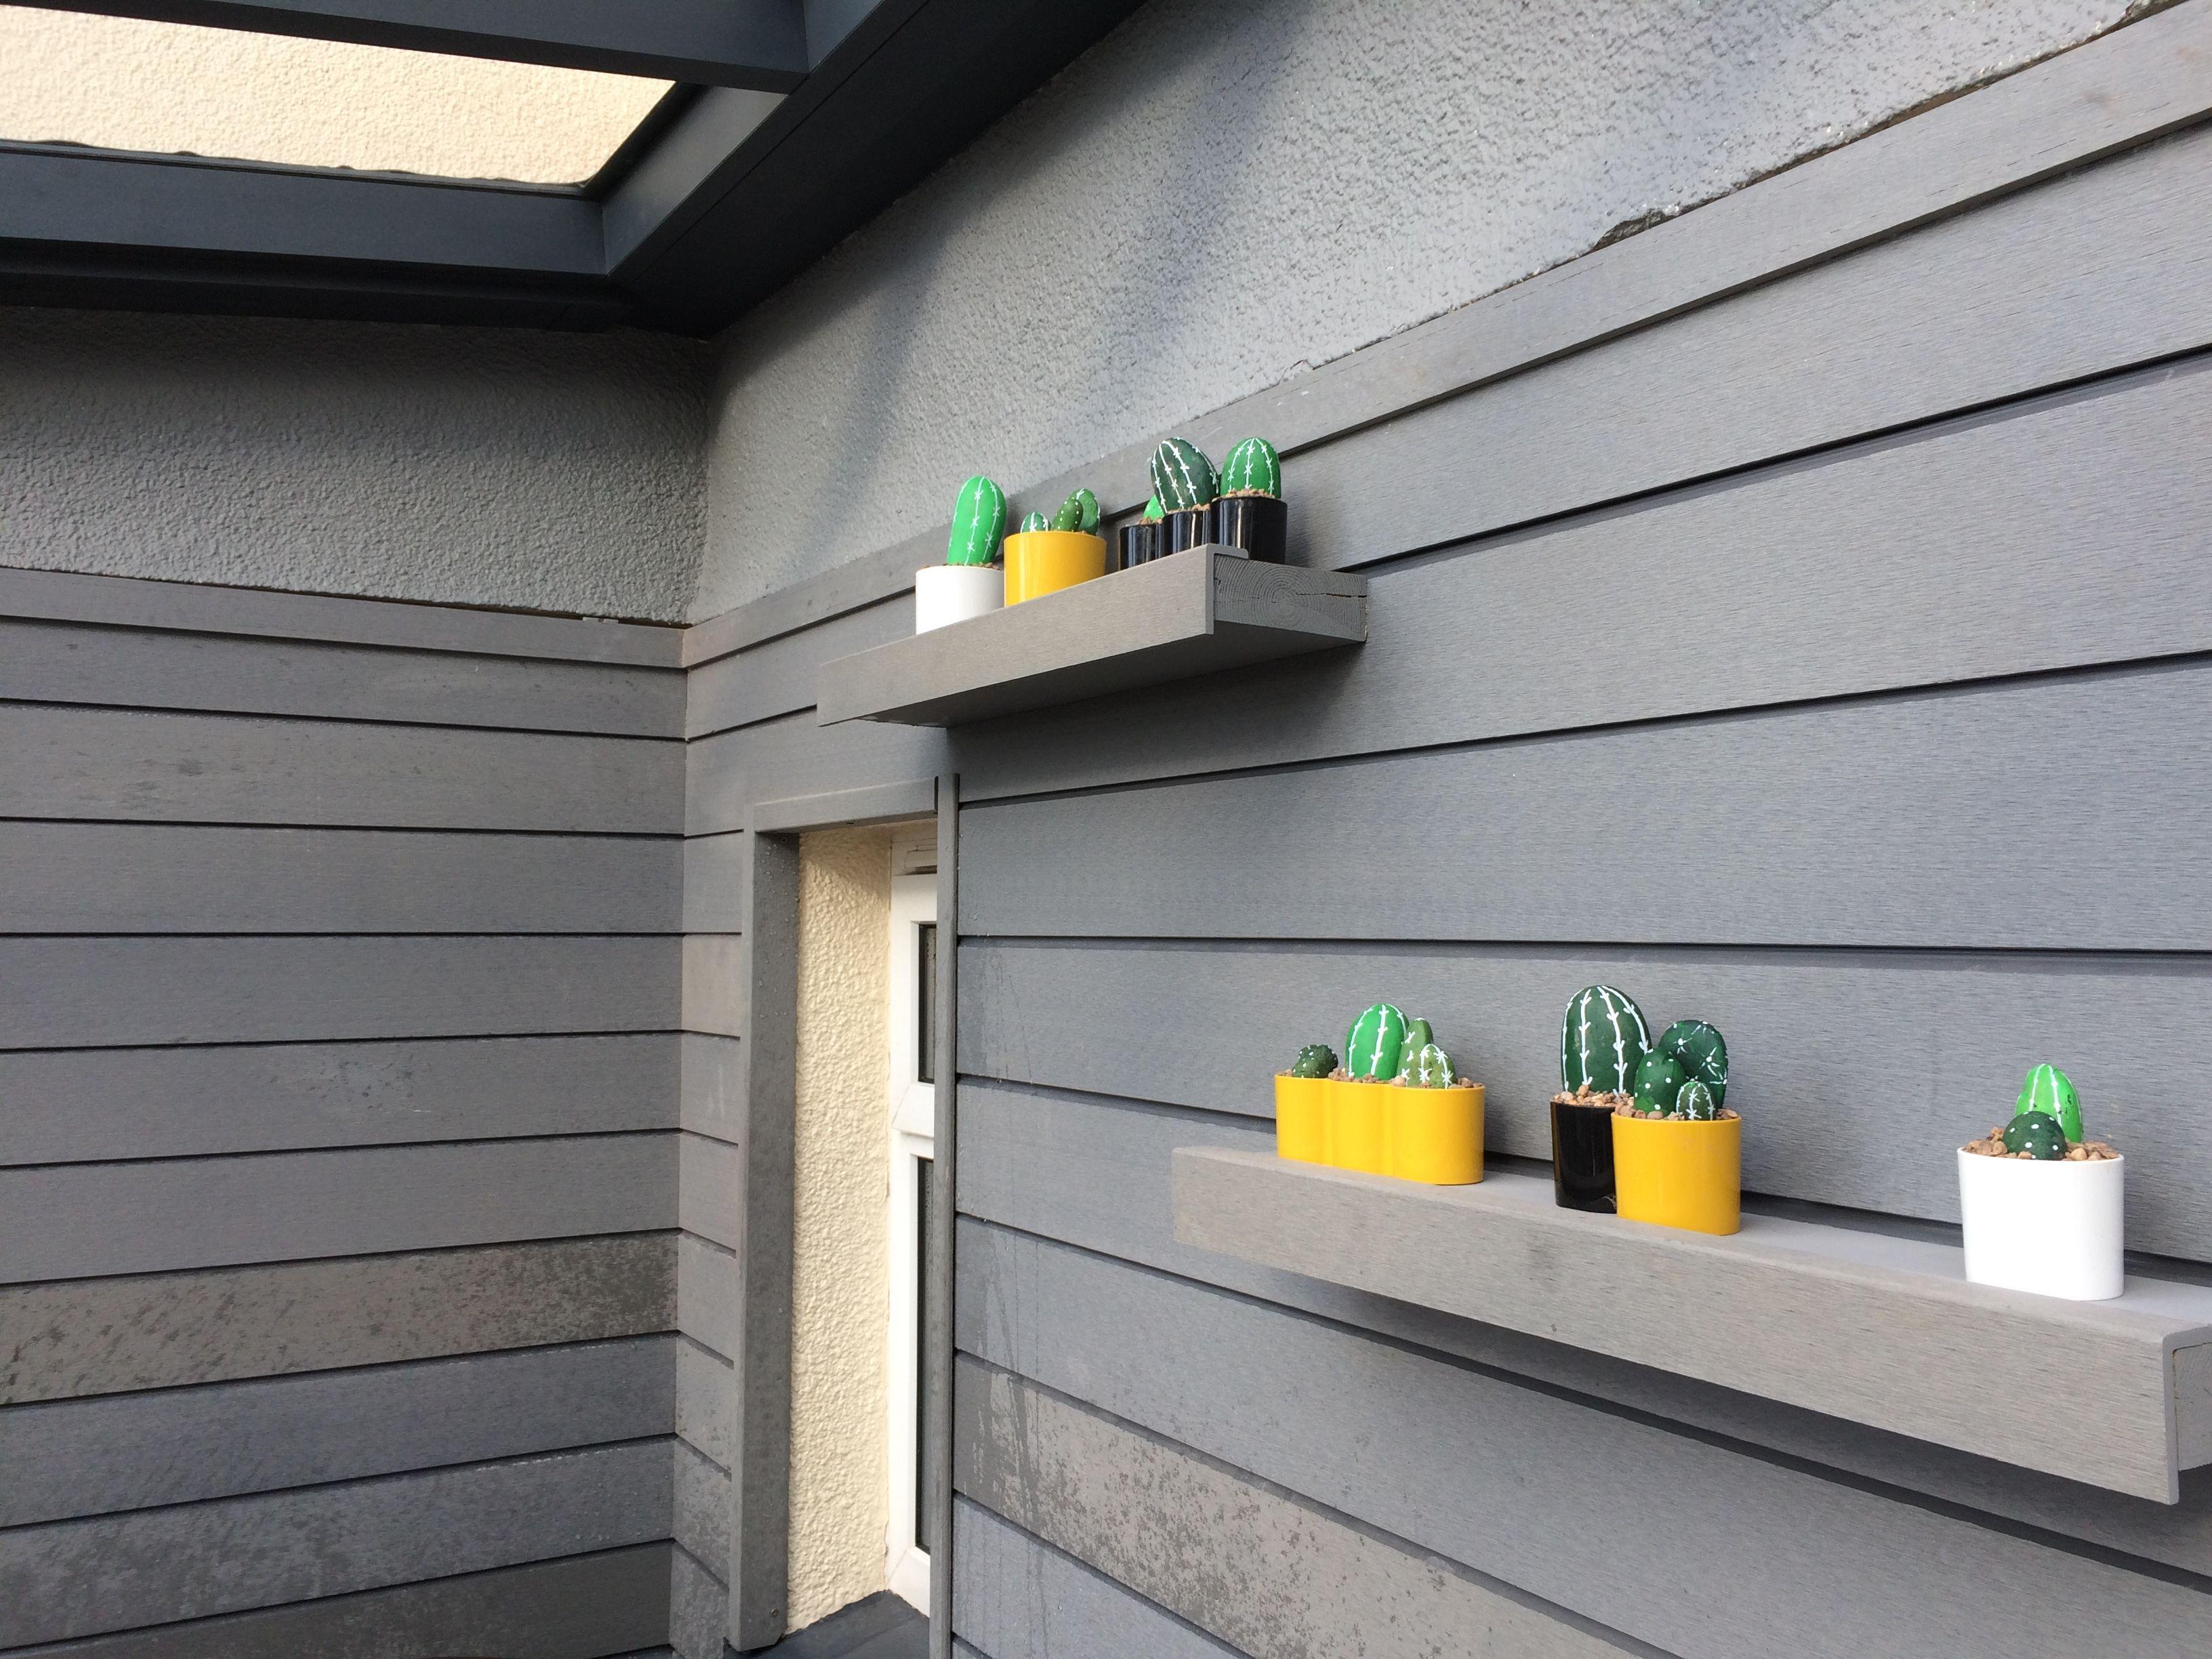 SAMPLE OF Low Maintenance Exterior Garden Composite Cladding in TEAK